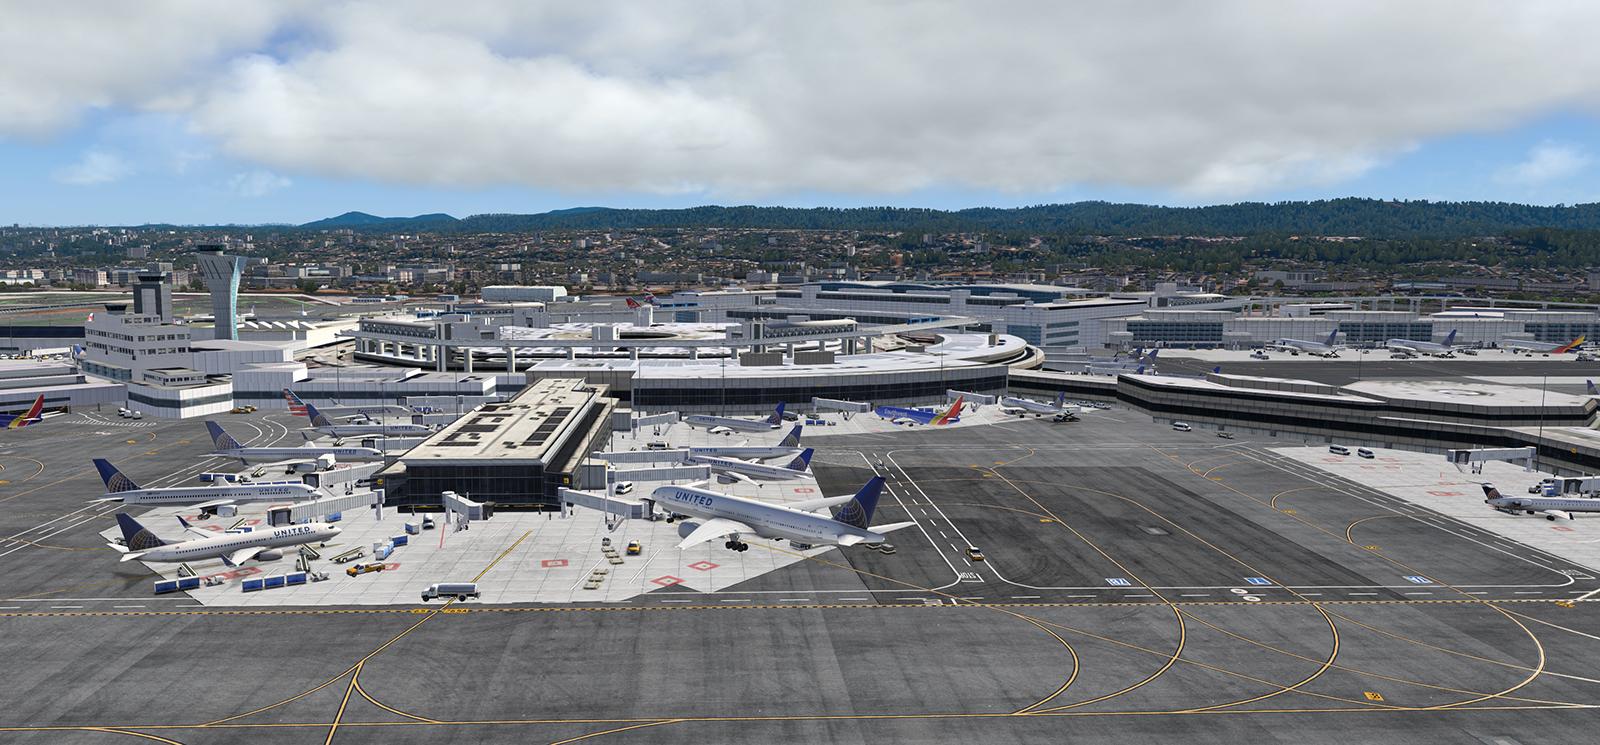 A320 - 2019-12-14 002